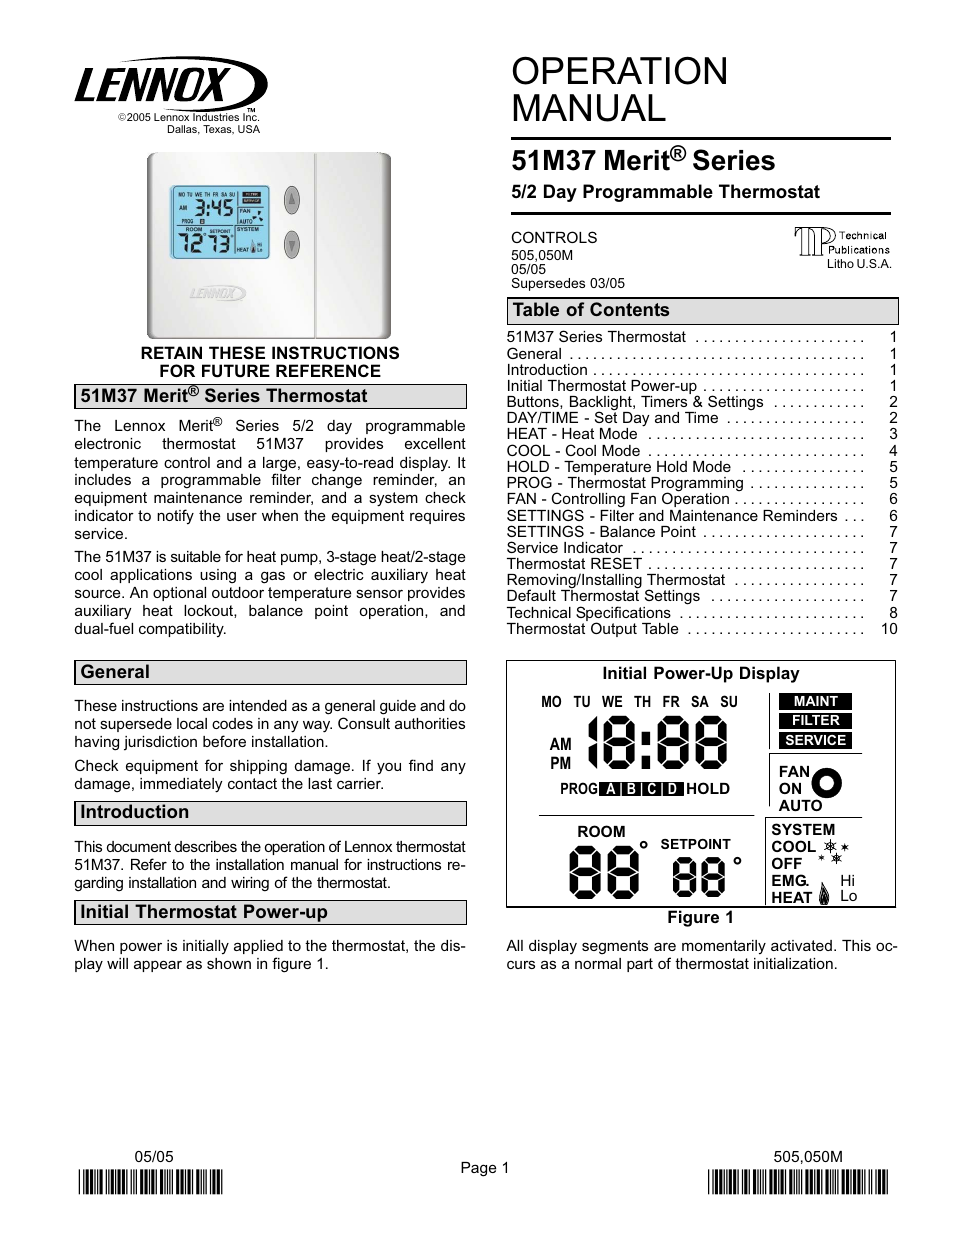 Modern Lennox 14g2701 Thermostat Wiring Diagram Motif - Wiring ...